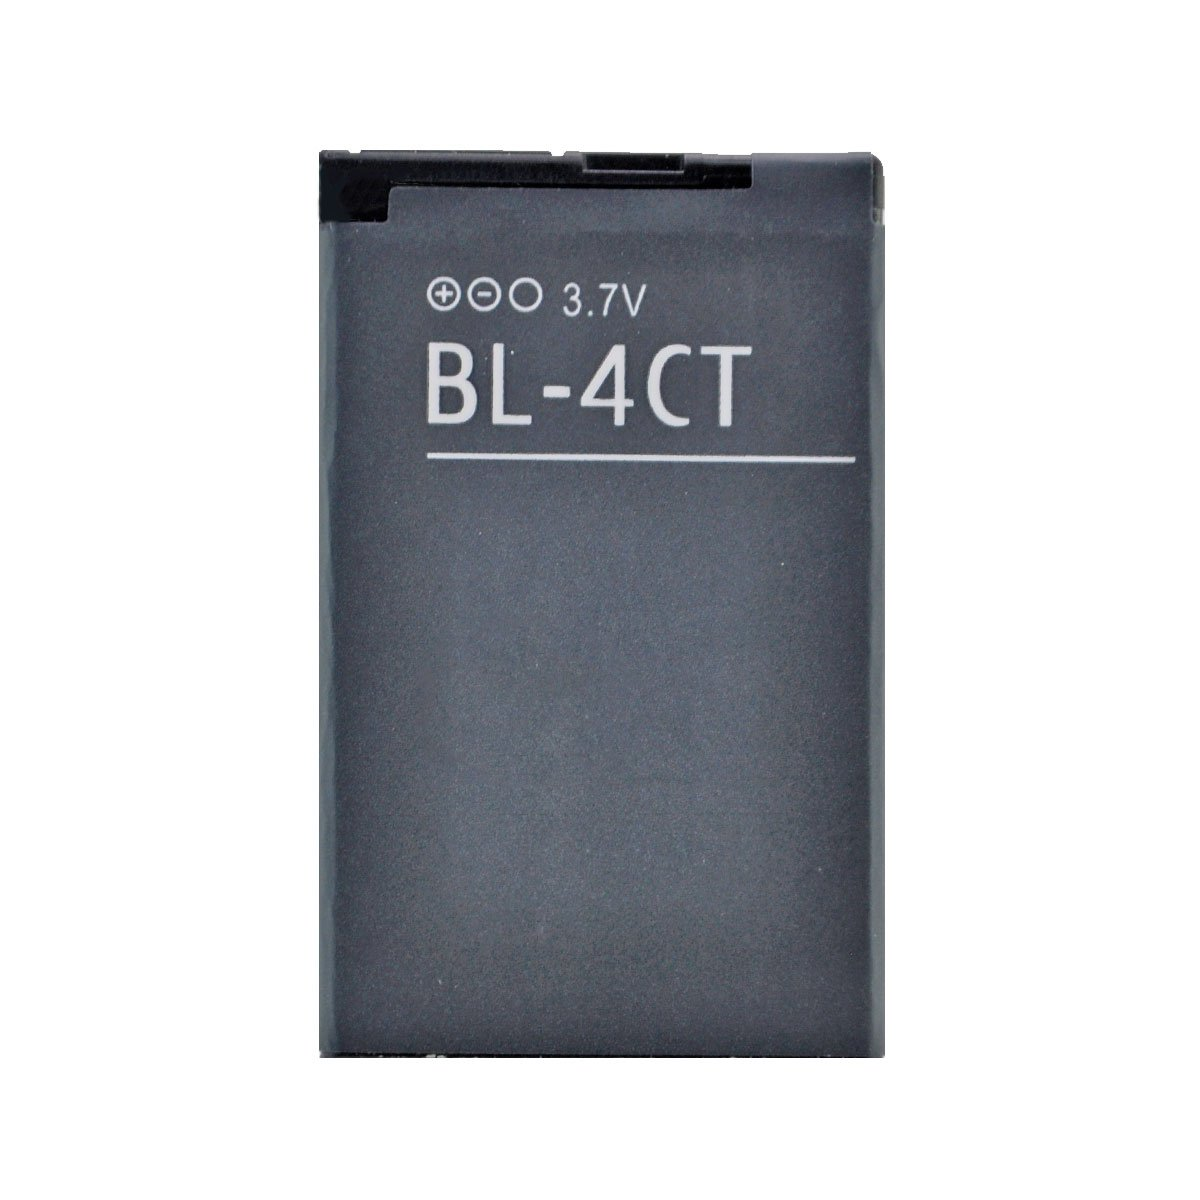 Аккумуляторная батарея для Nokia 6700s BL-4CT